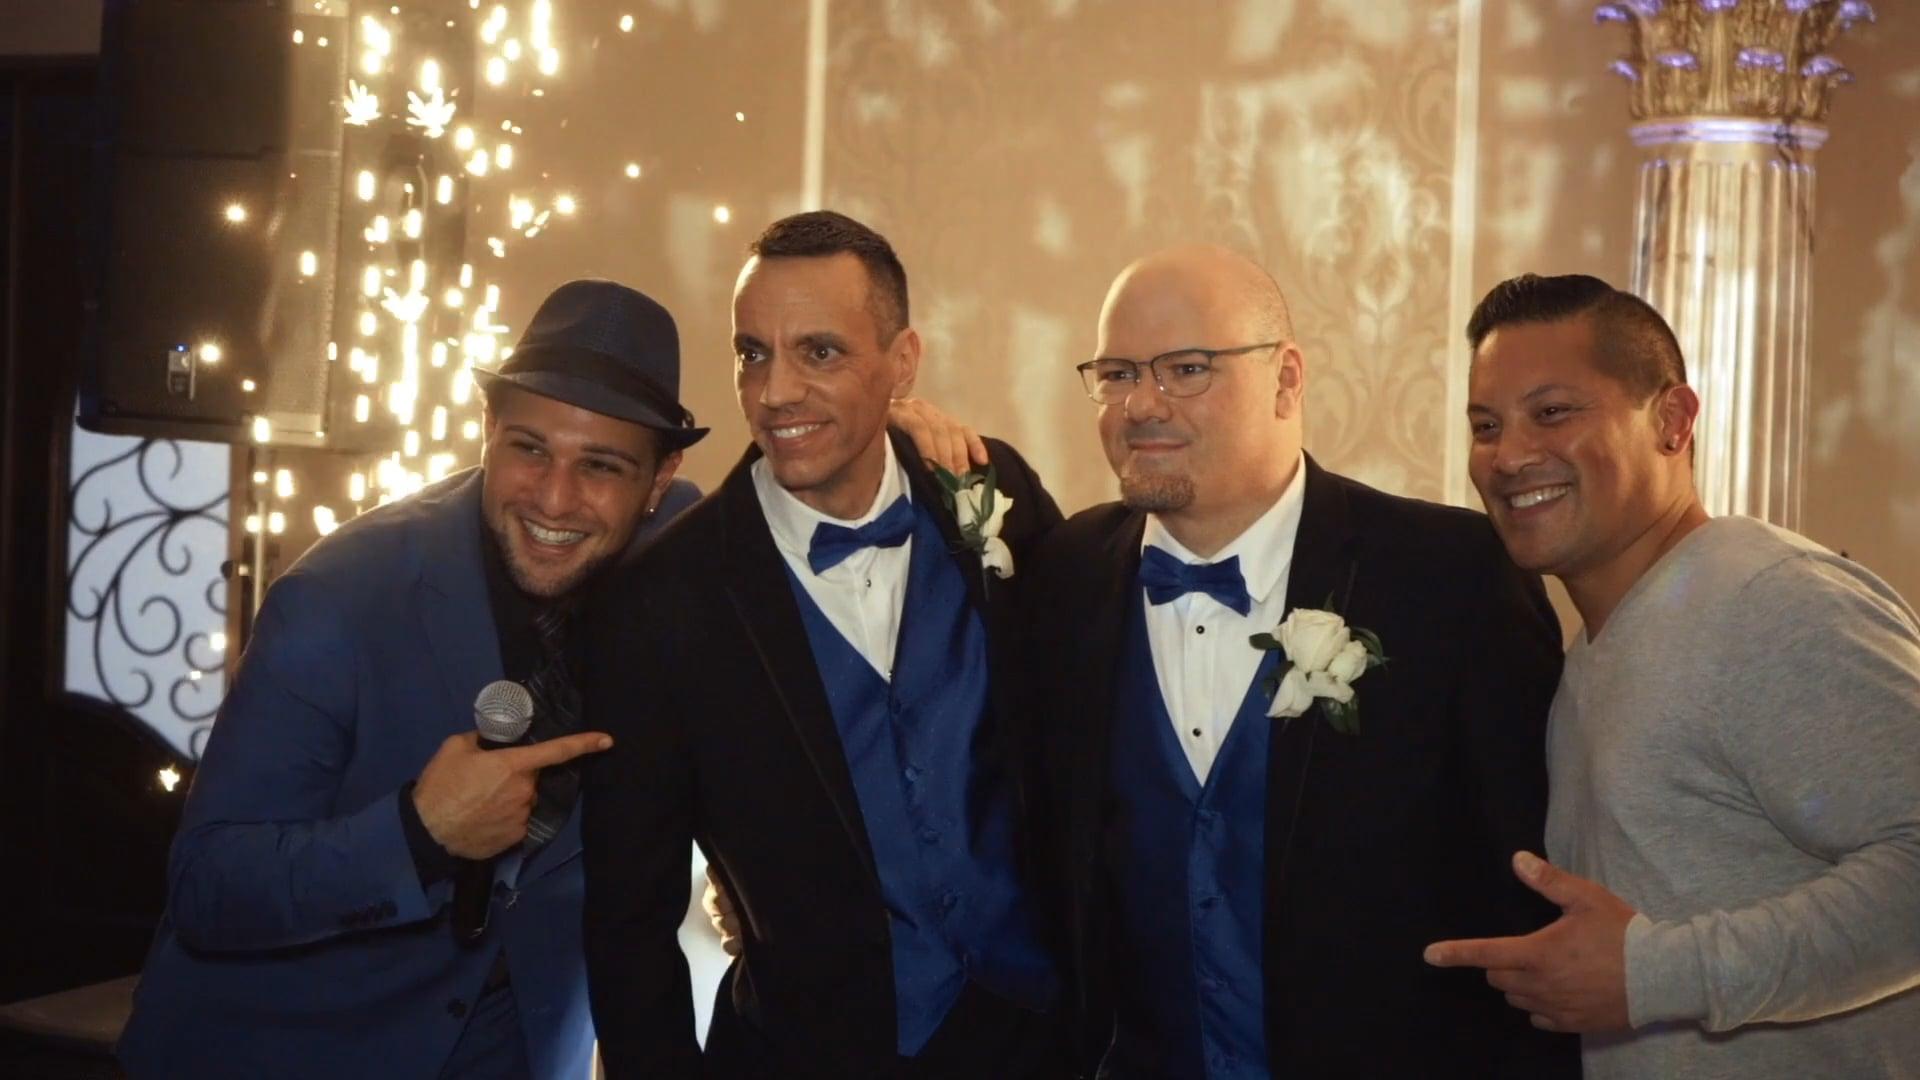 Rob & Kevin's Wedding